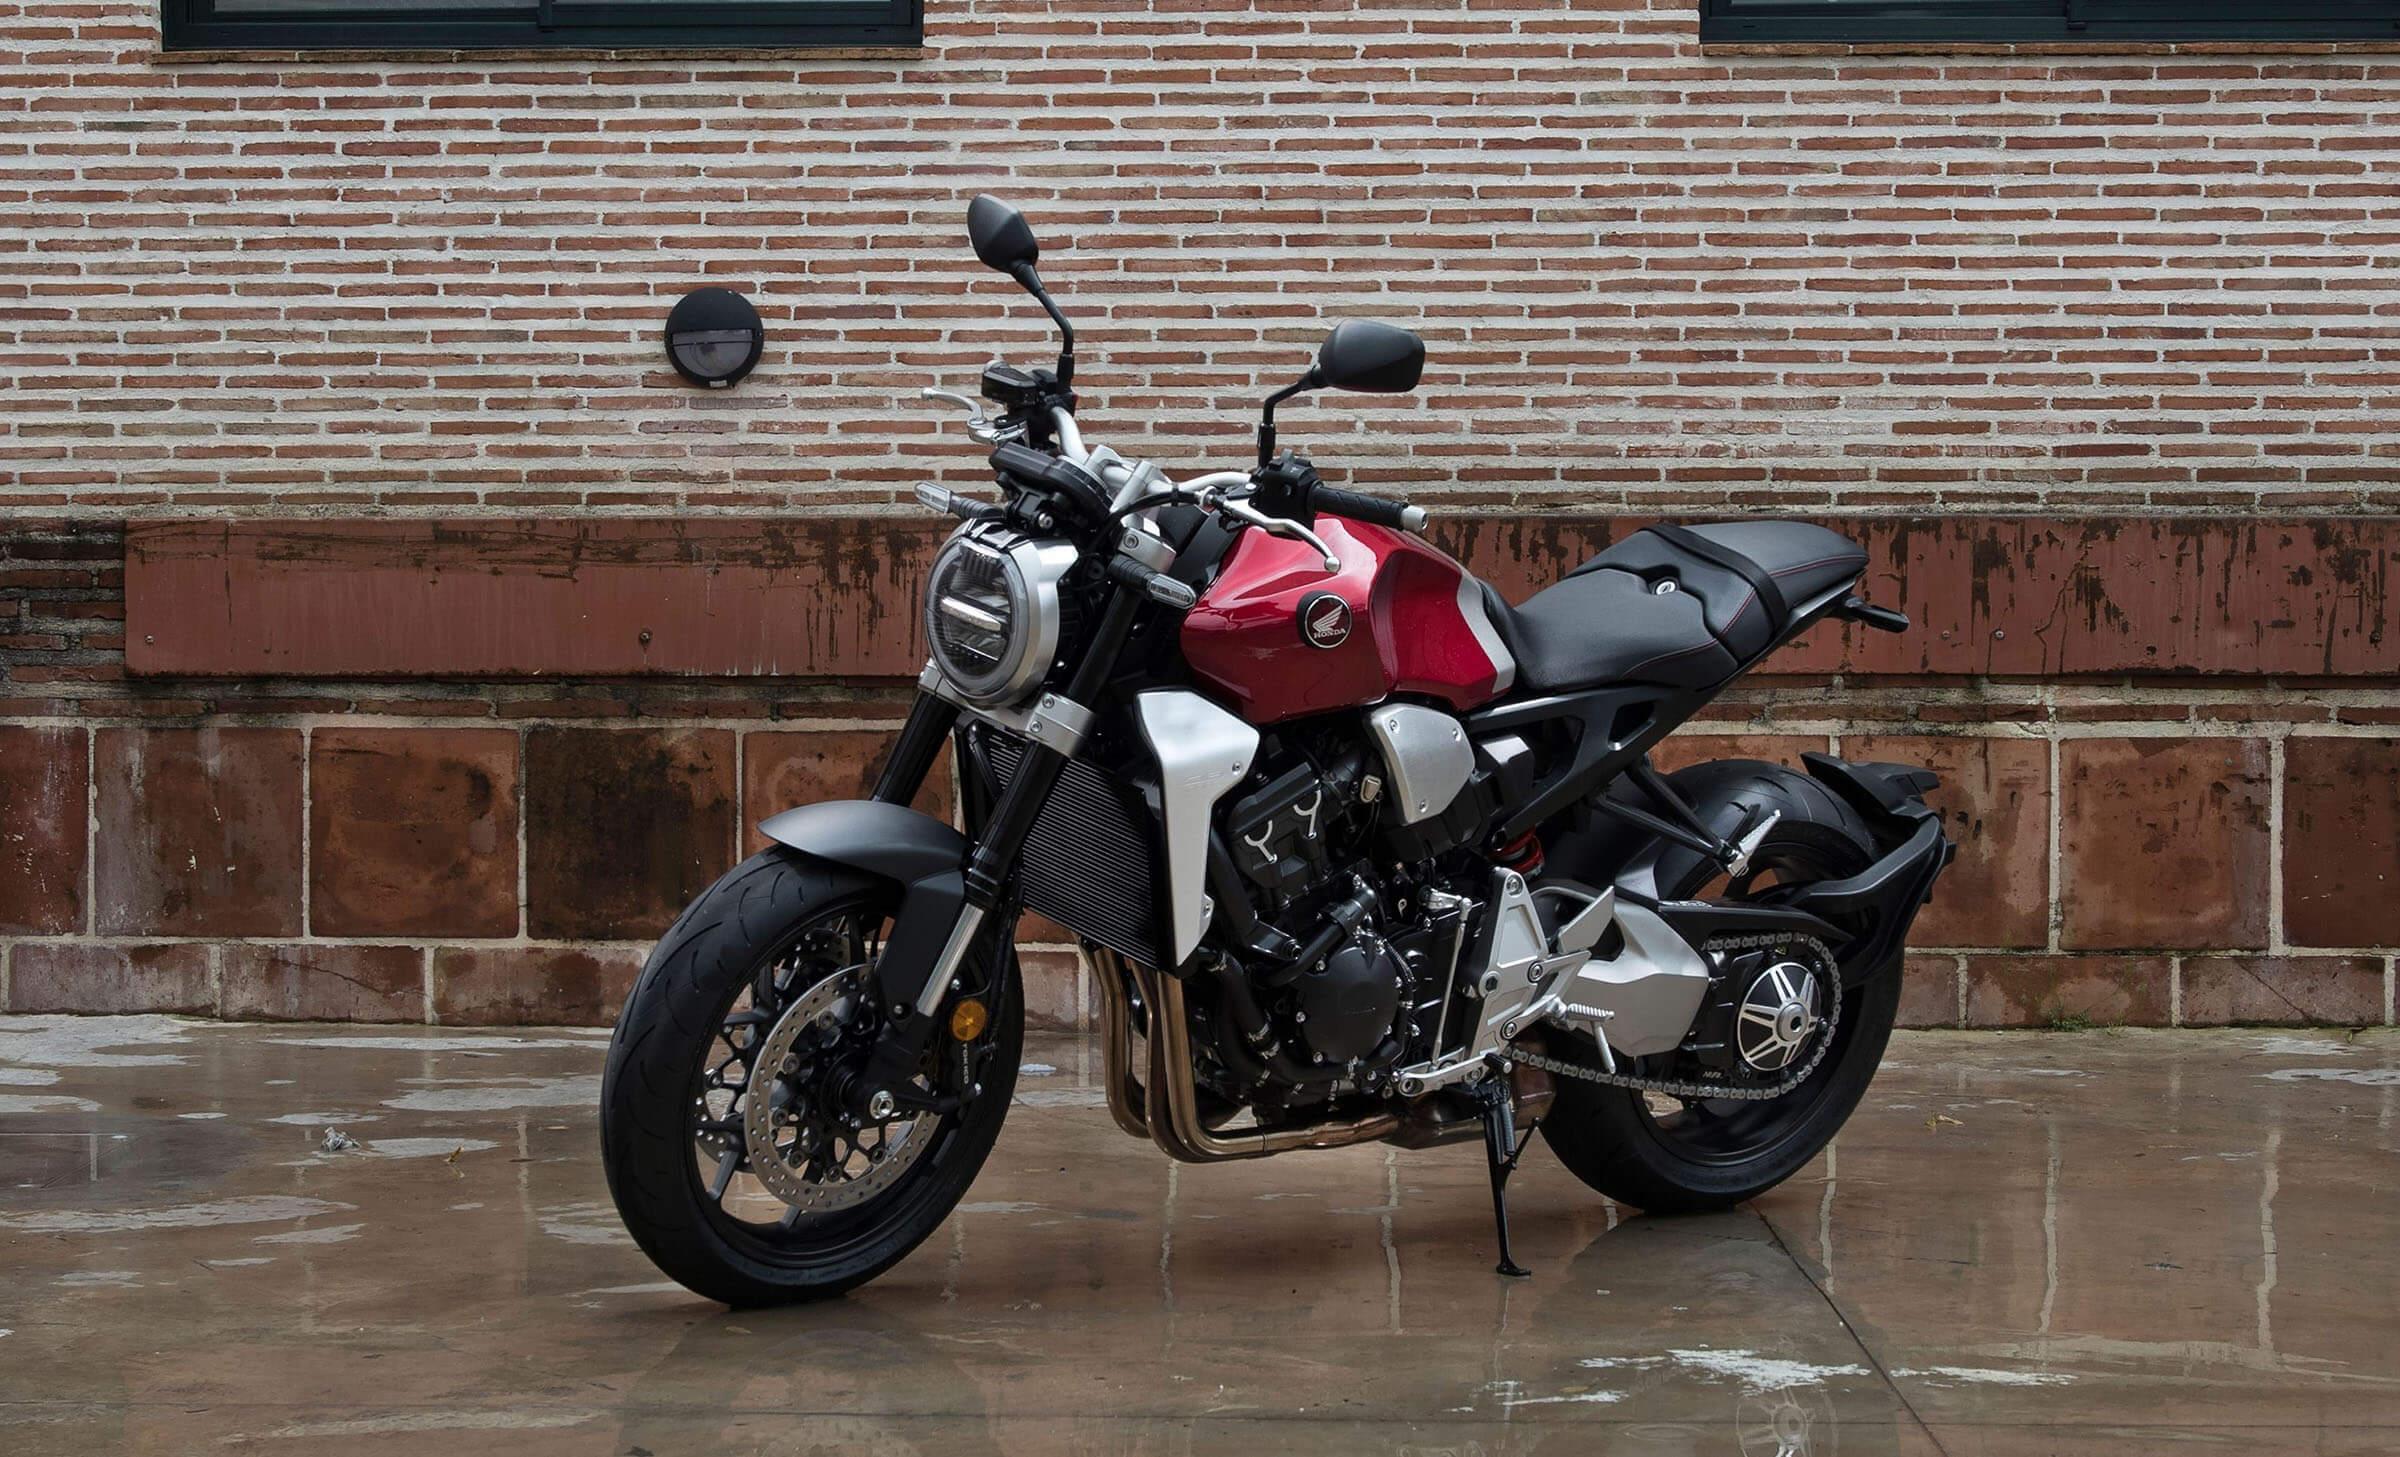 2020 Honda CB1000R receives a facelift and more power   Visordown